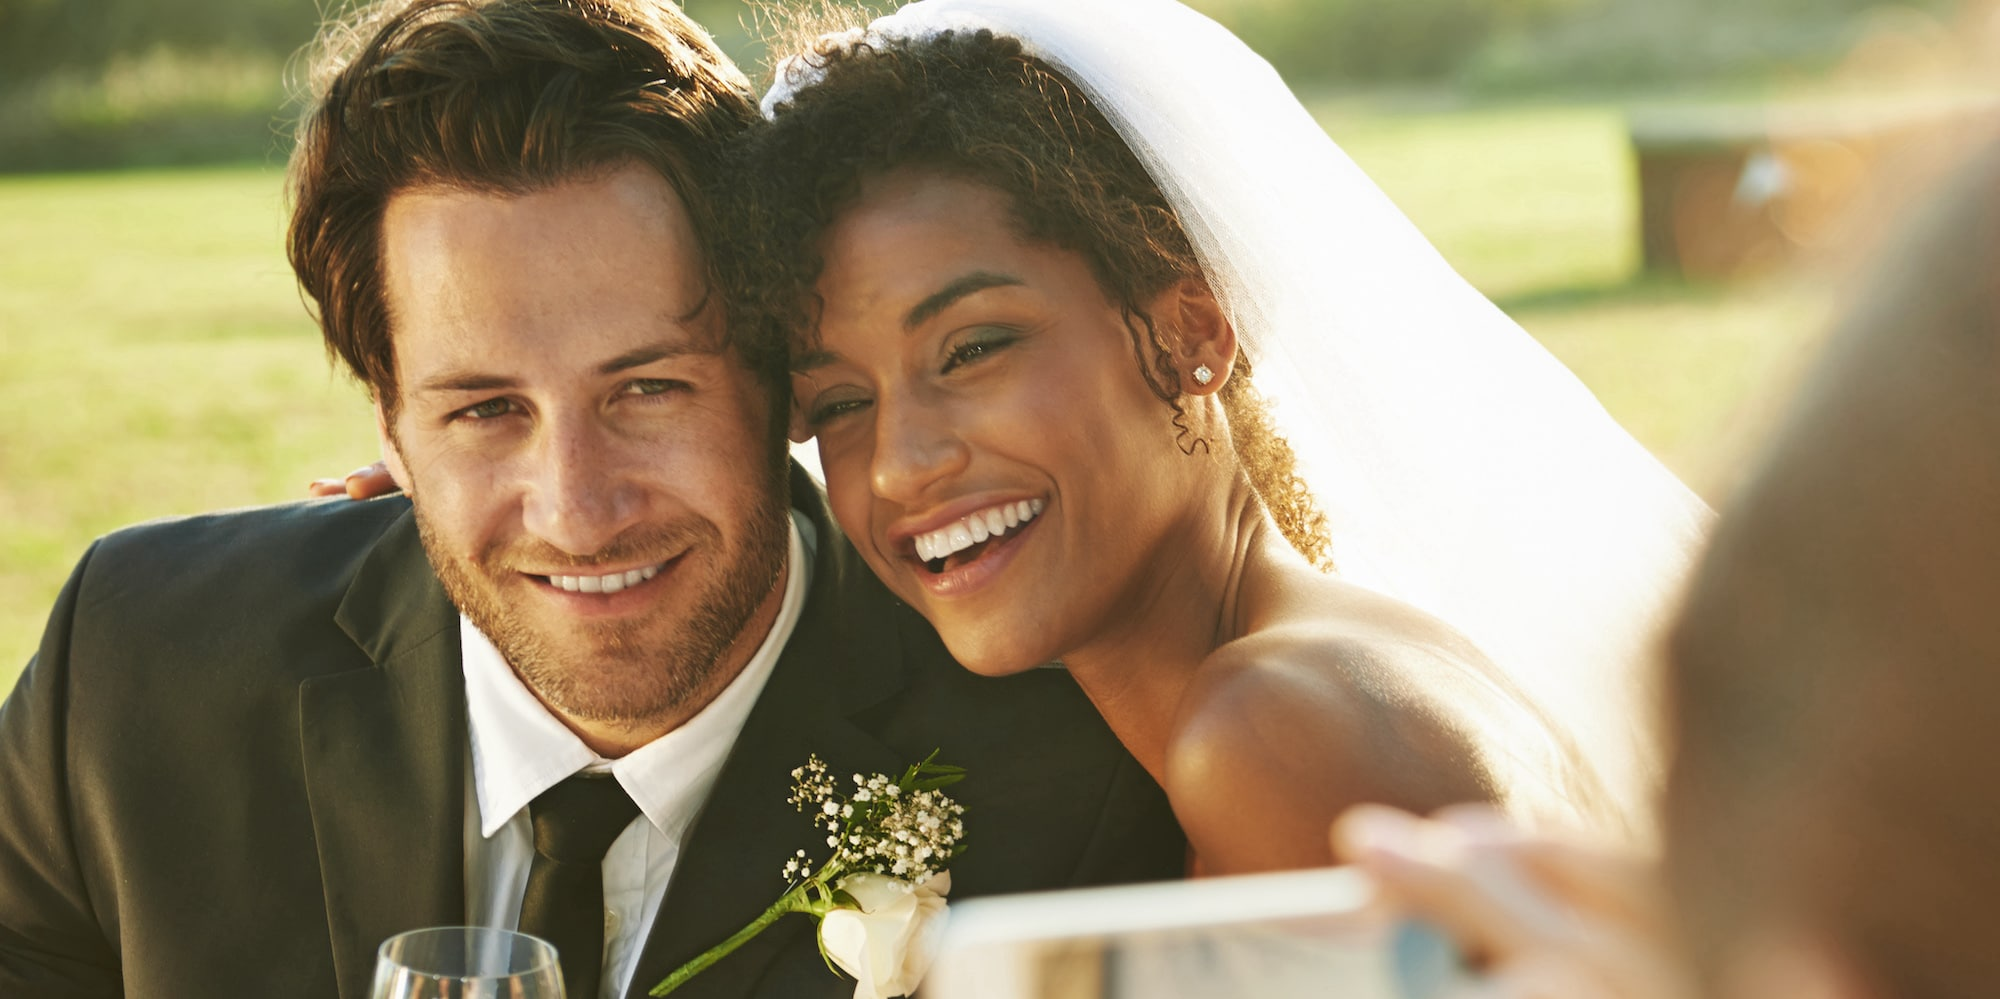 Best Gift Ideas for Weddings